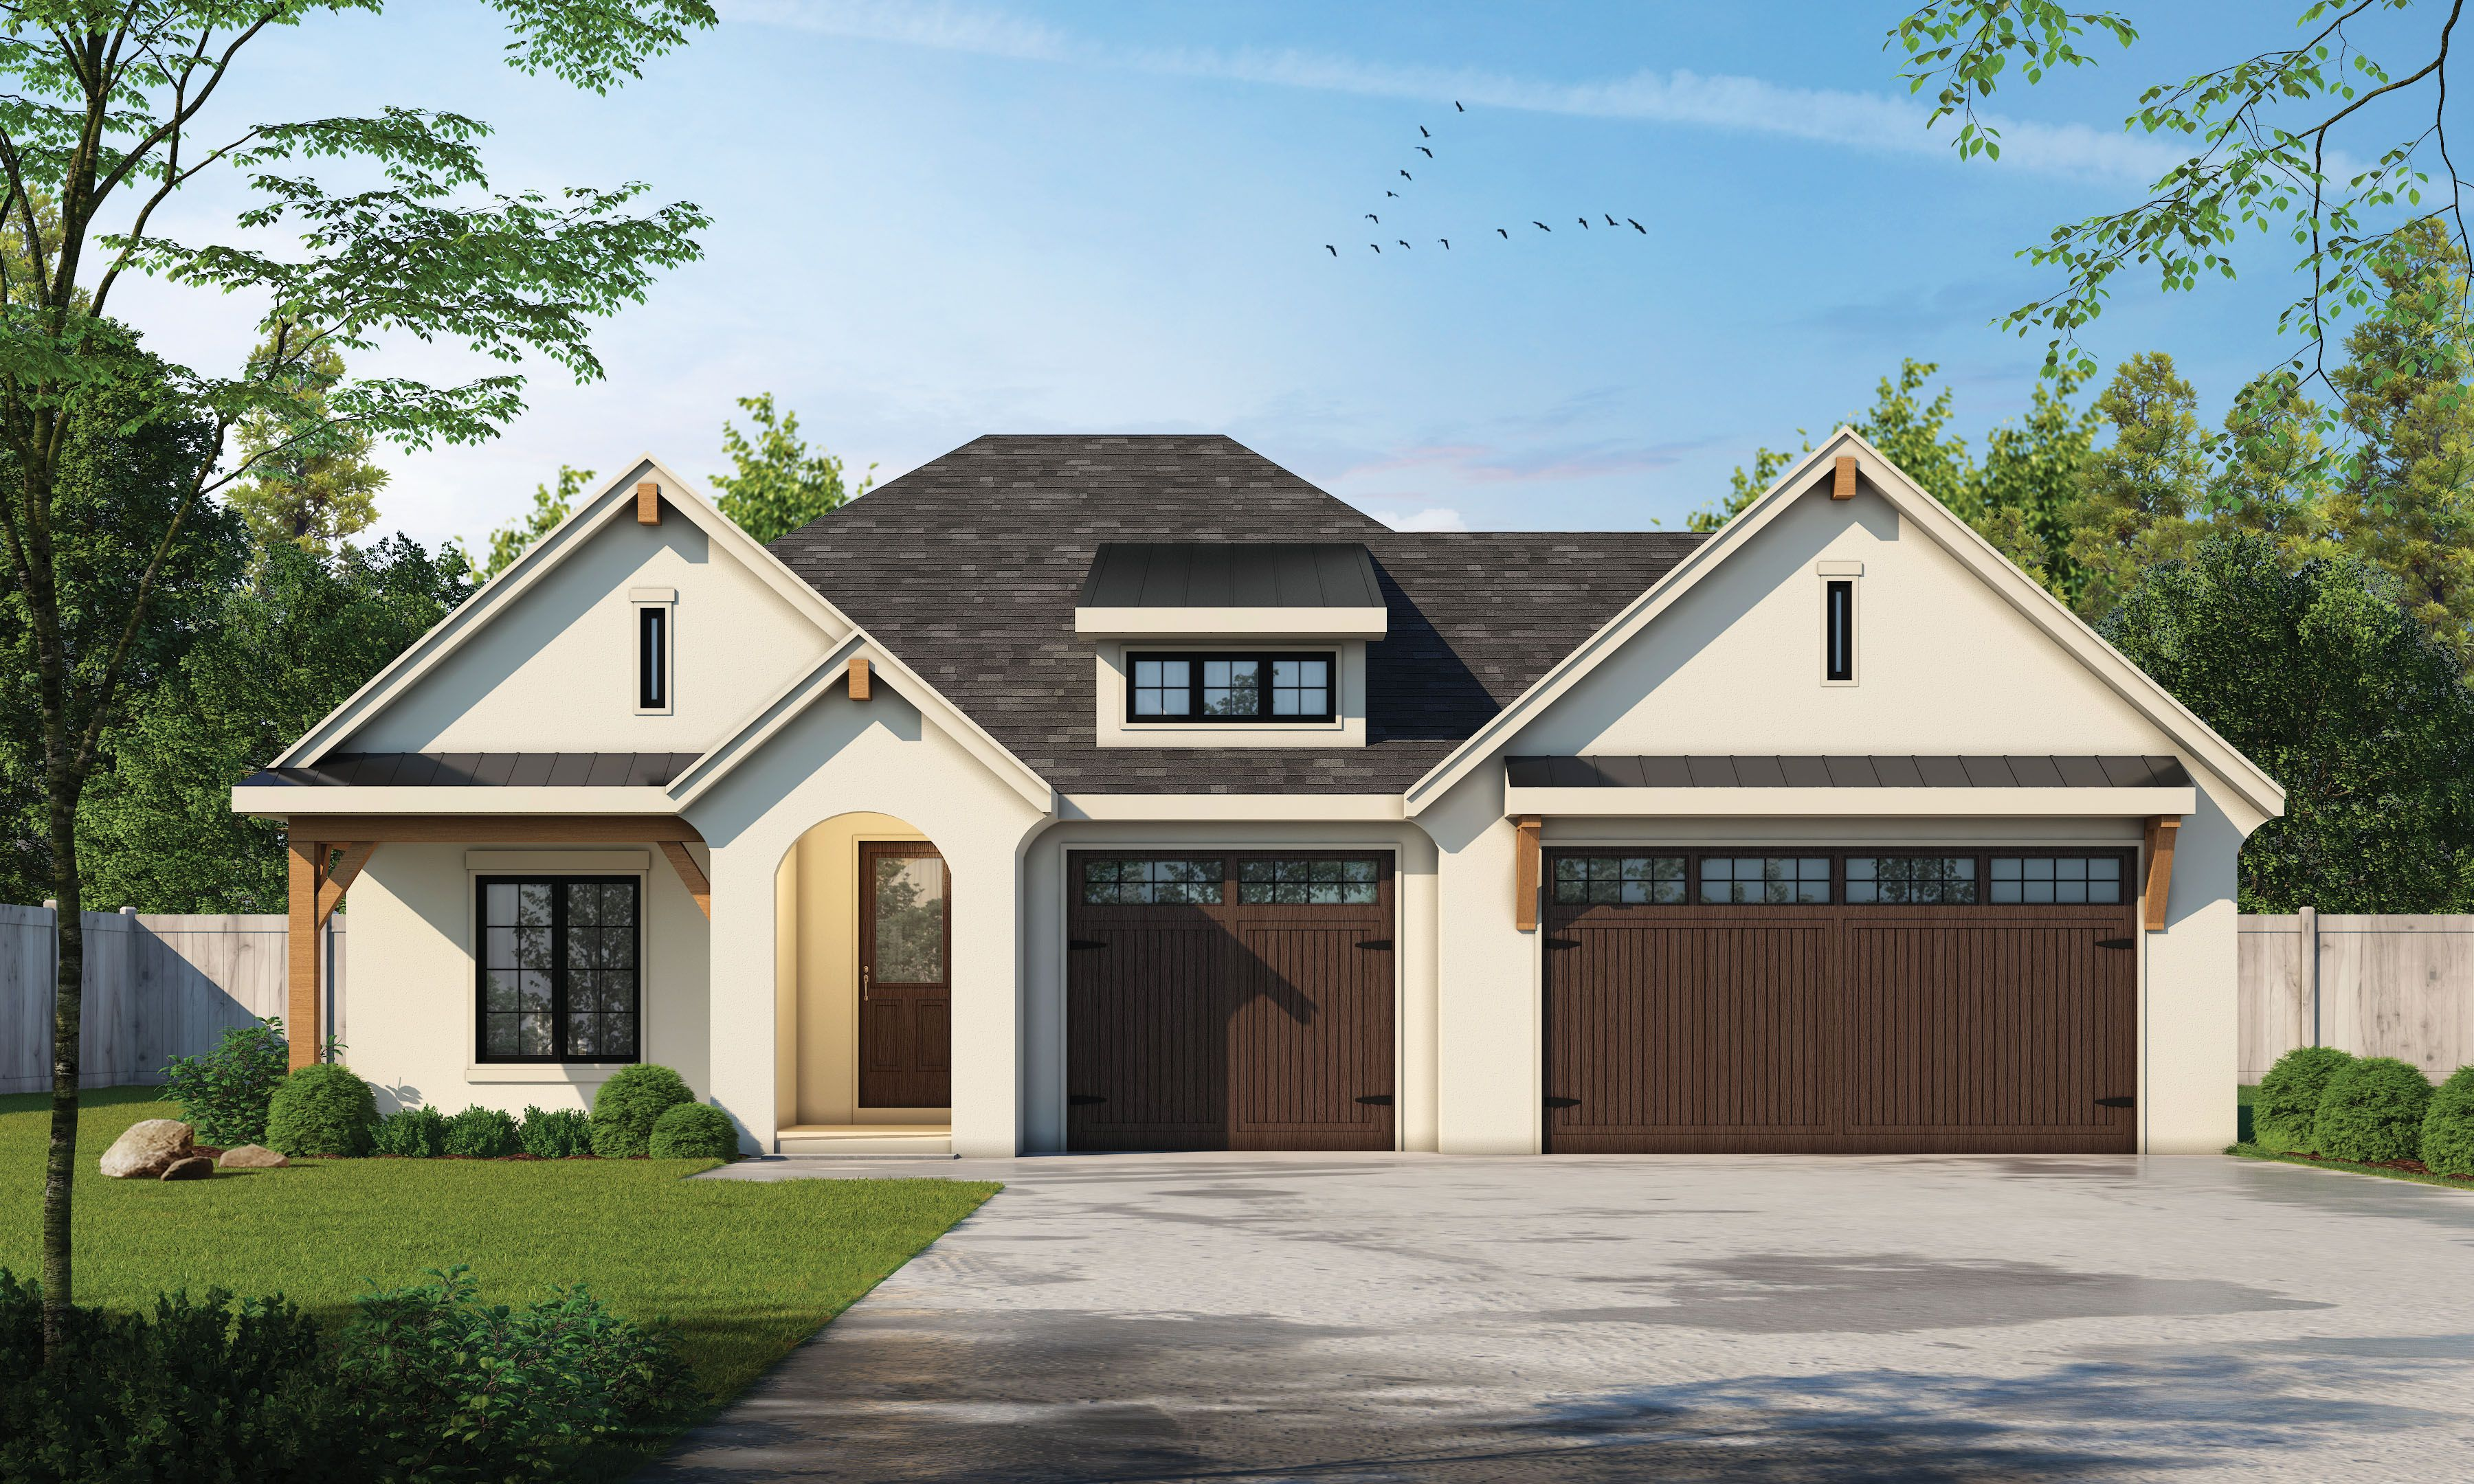 Plan View Design Basics House Plans Beautiful Home Designs Design Basics